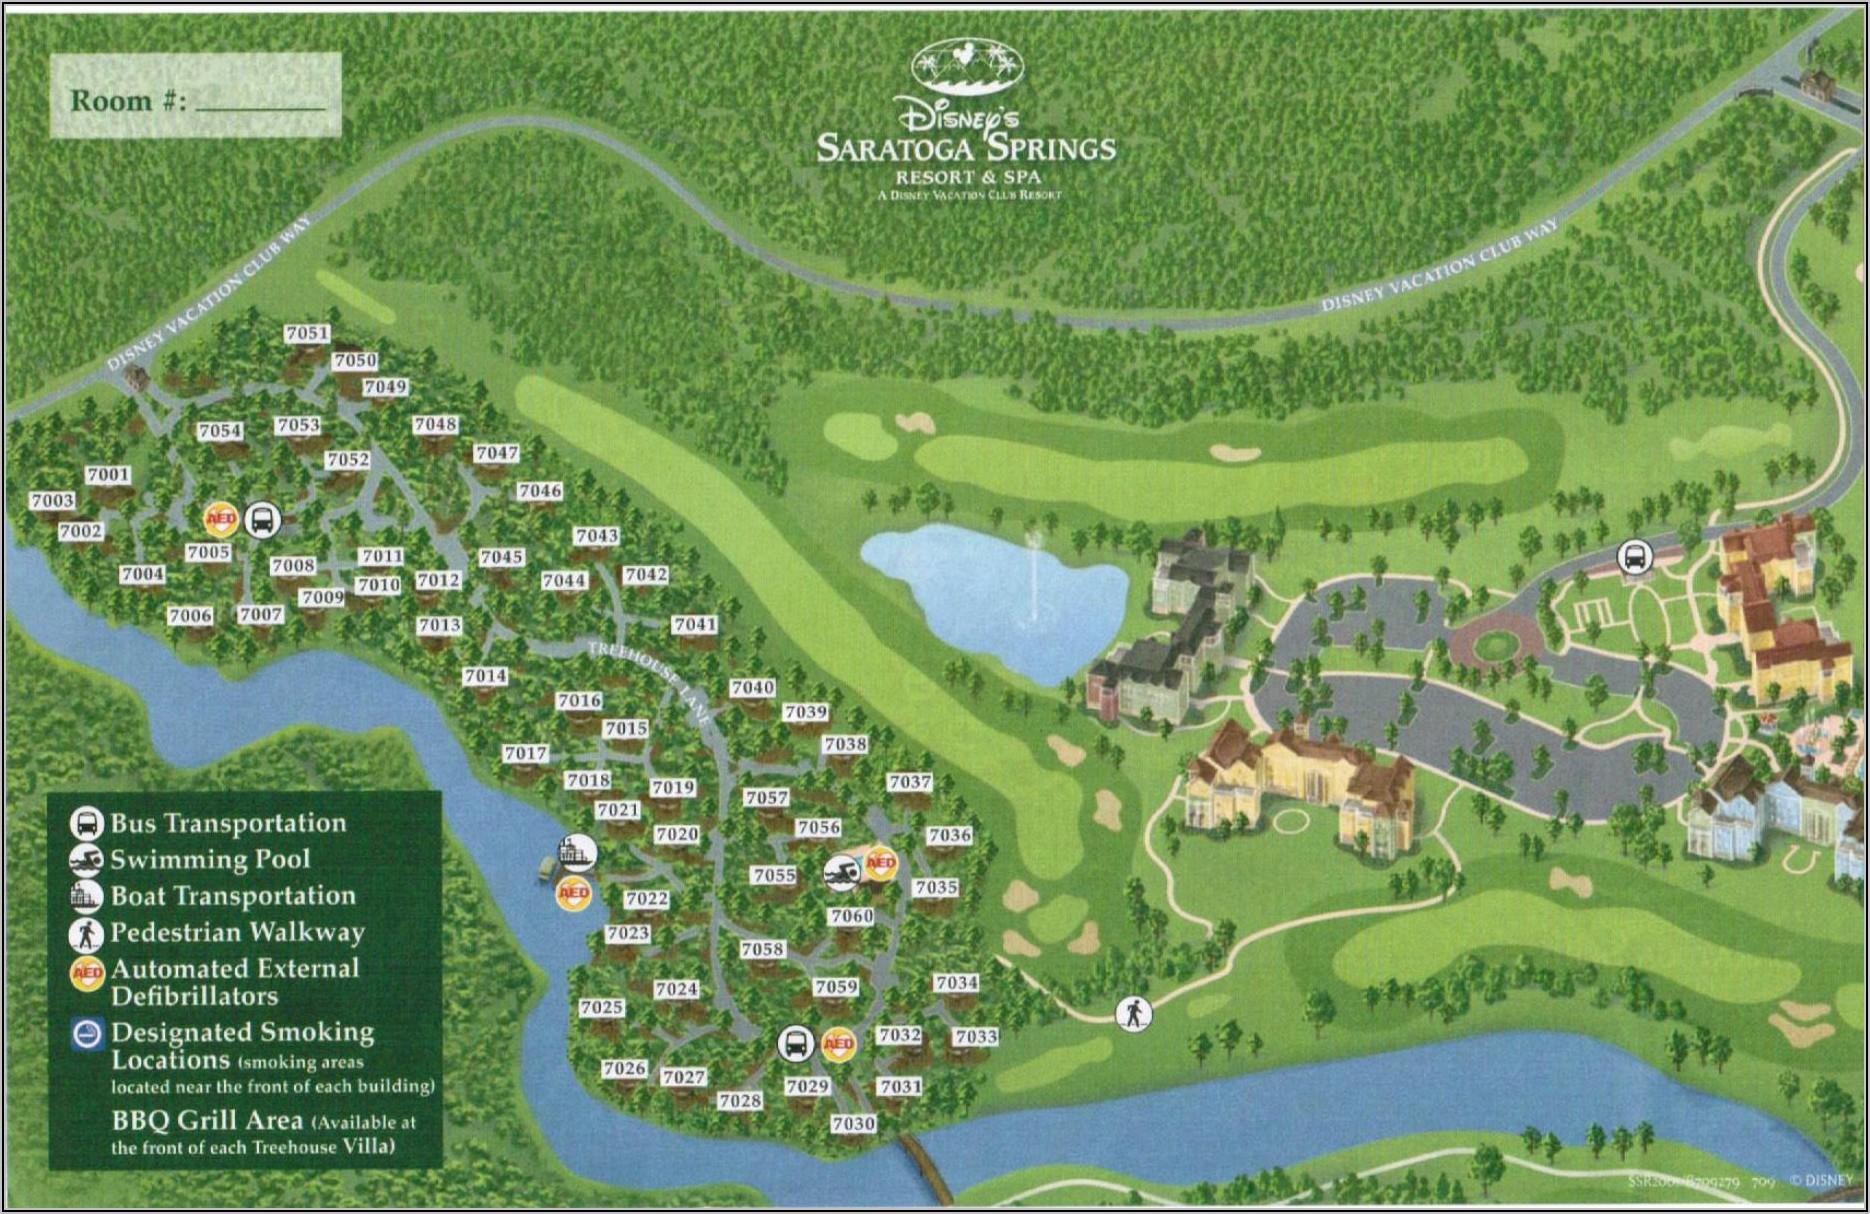 Disney Saratoga Springs Resort Layout